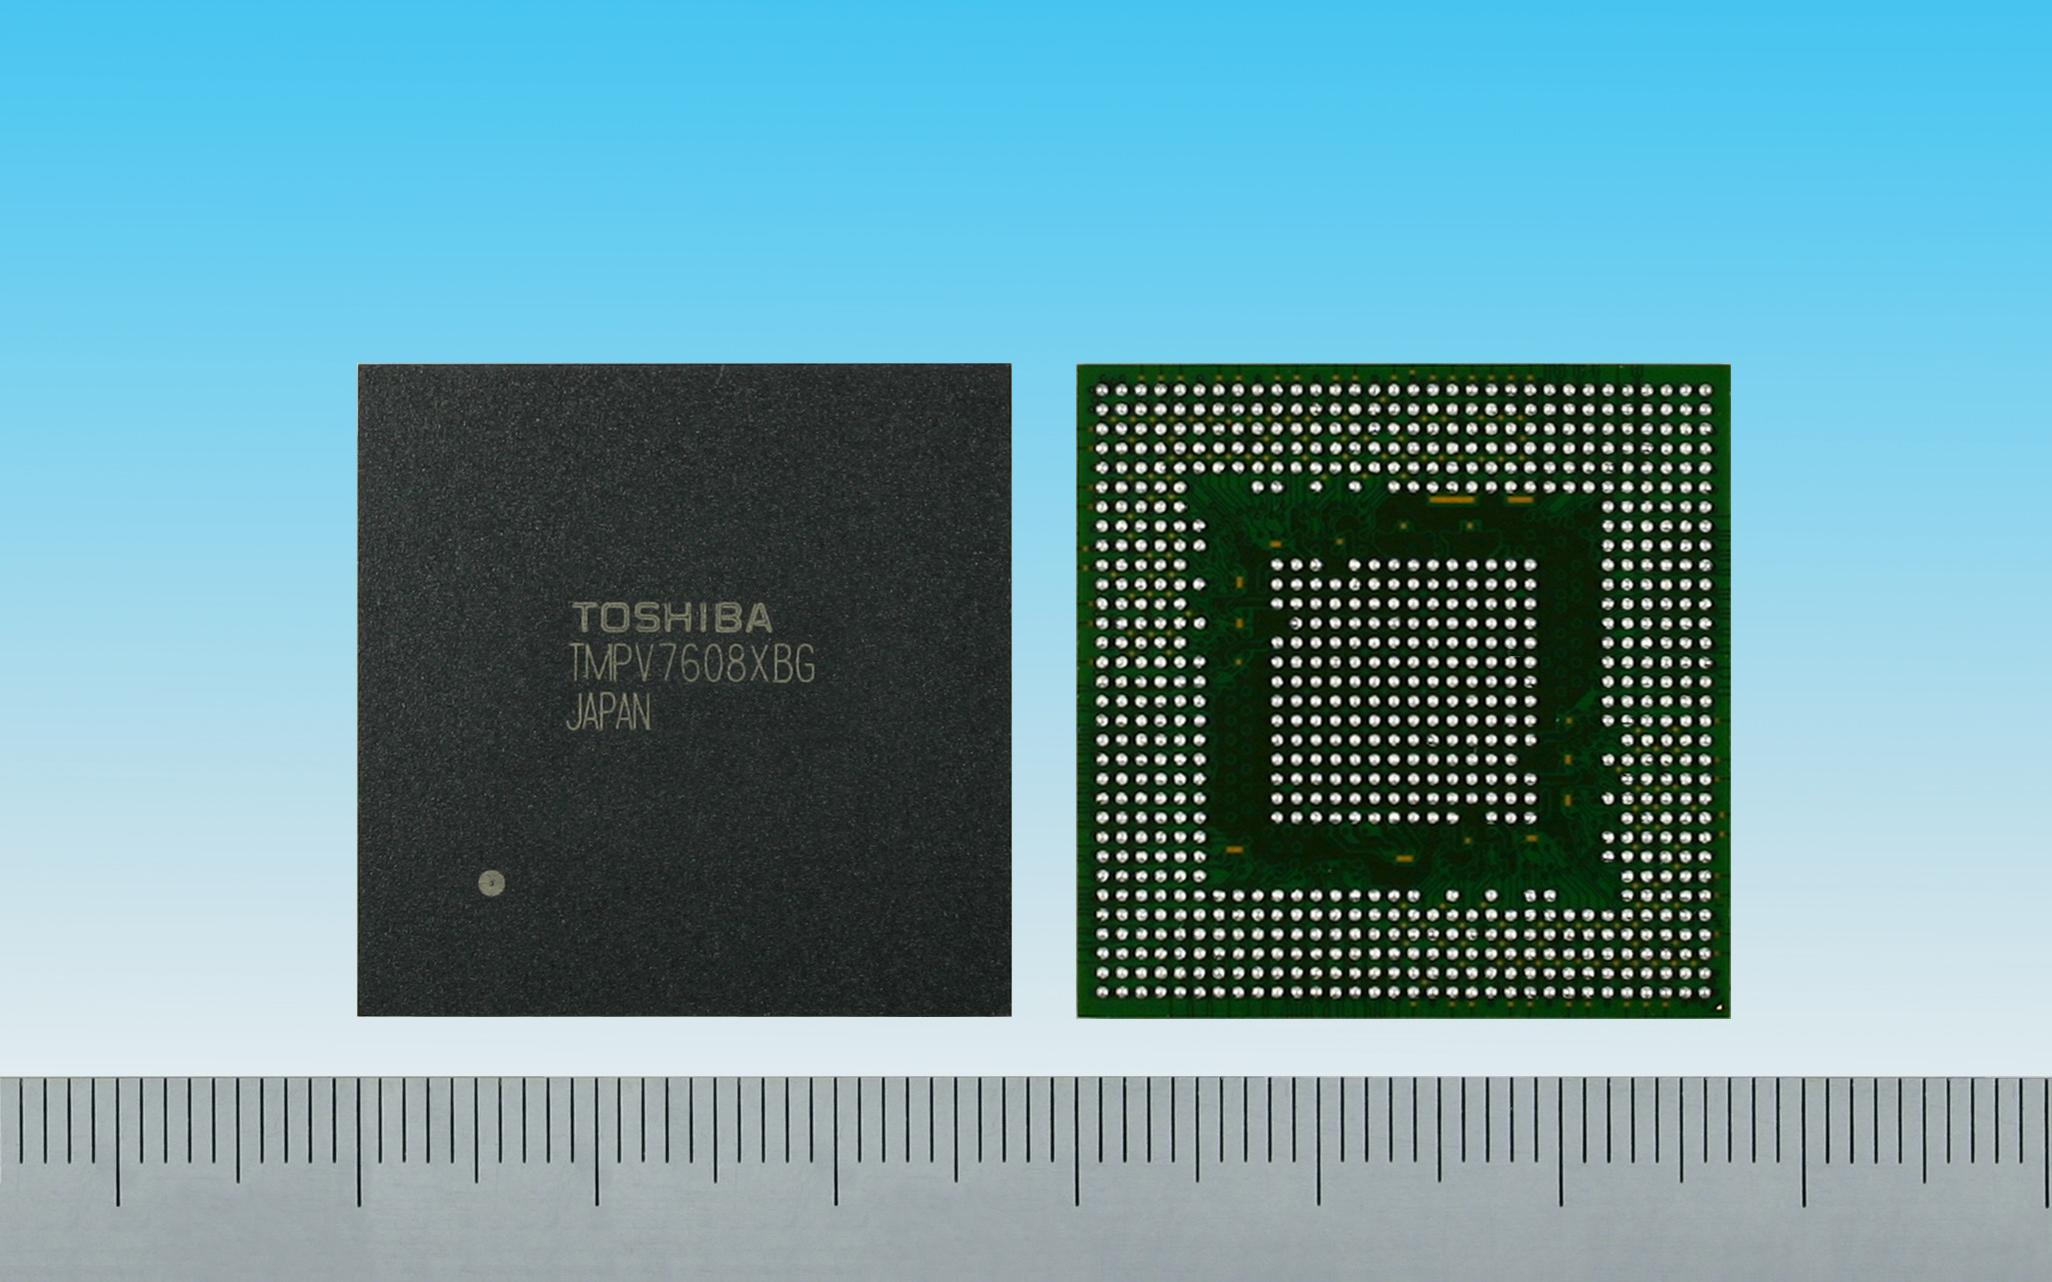 Toyota Alphard/Vellfire With Toshiba's Advanced Image